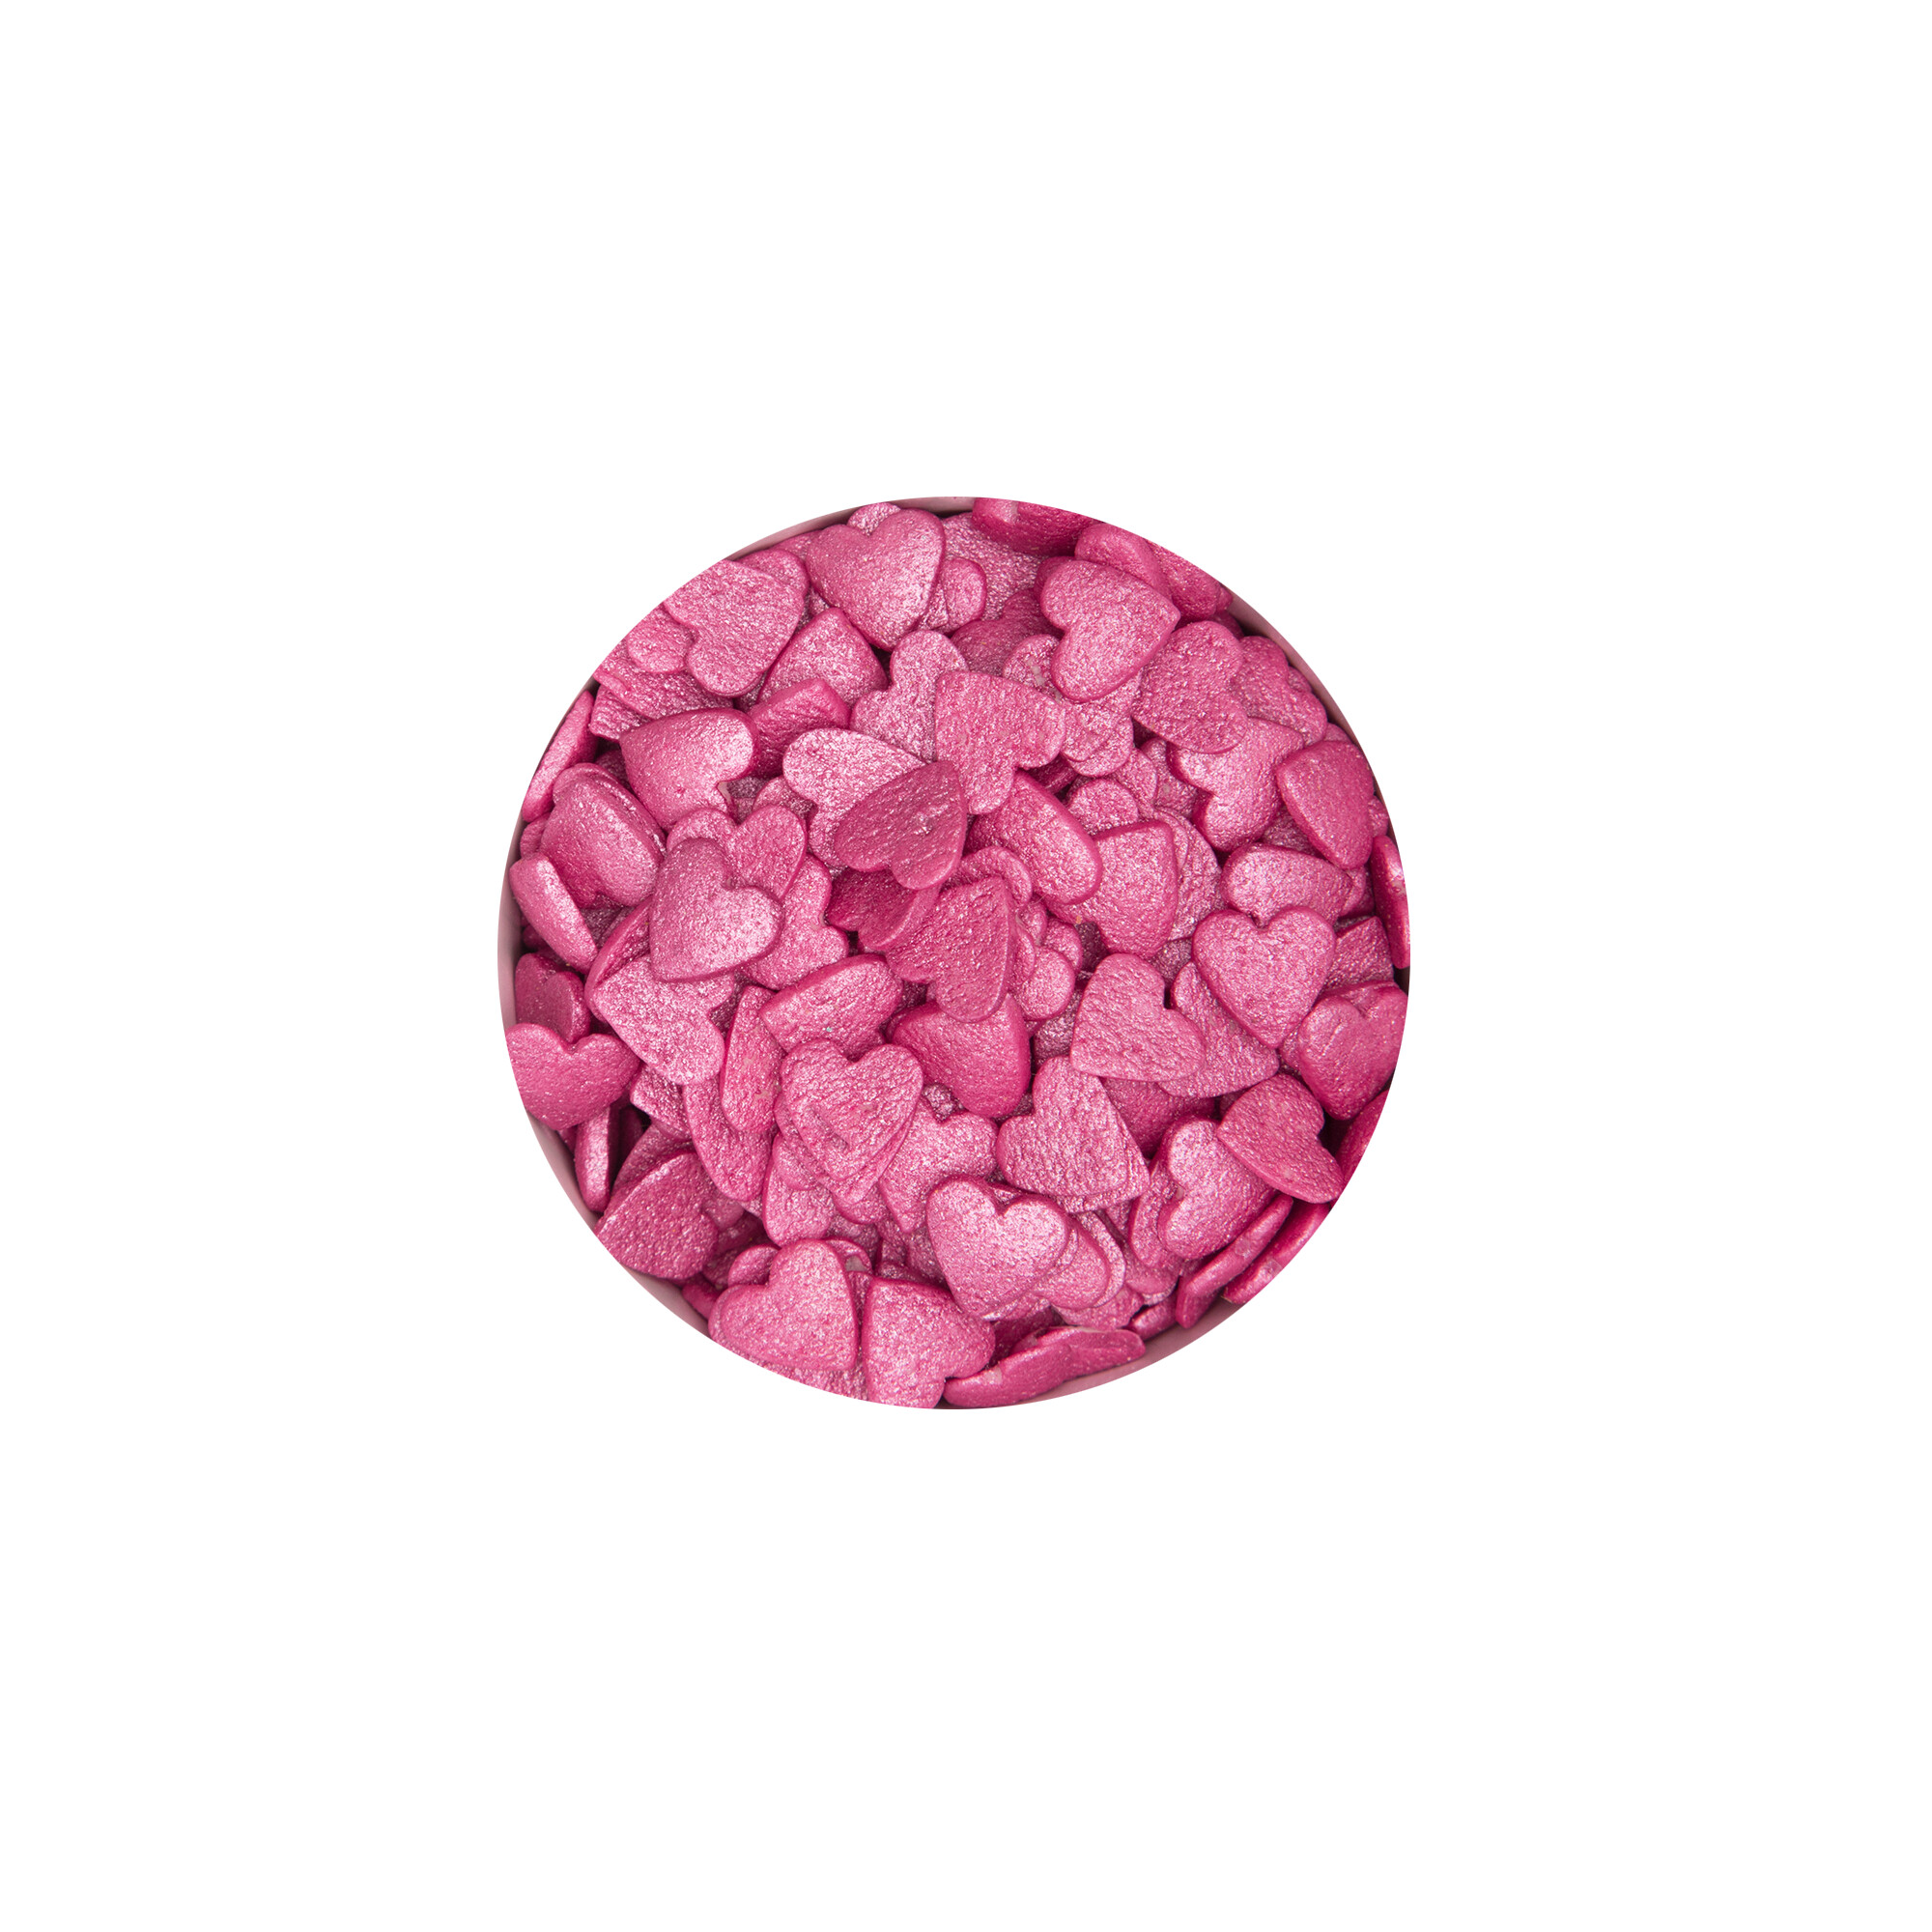 Edible sprinkle decoration - Hearts